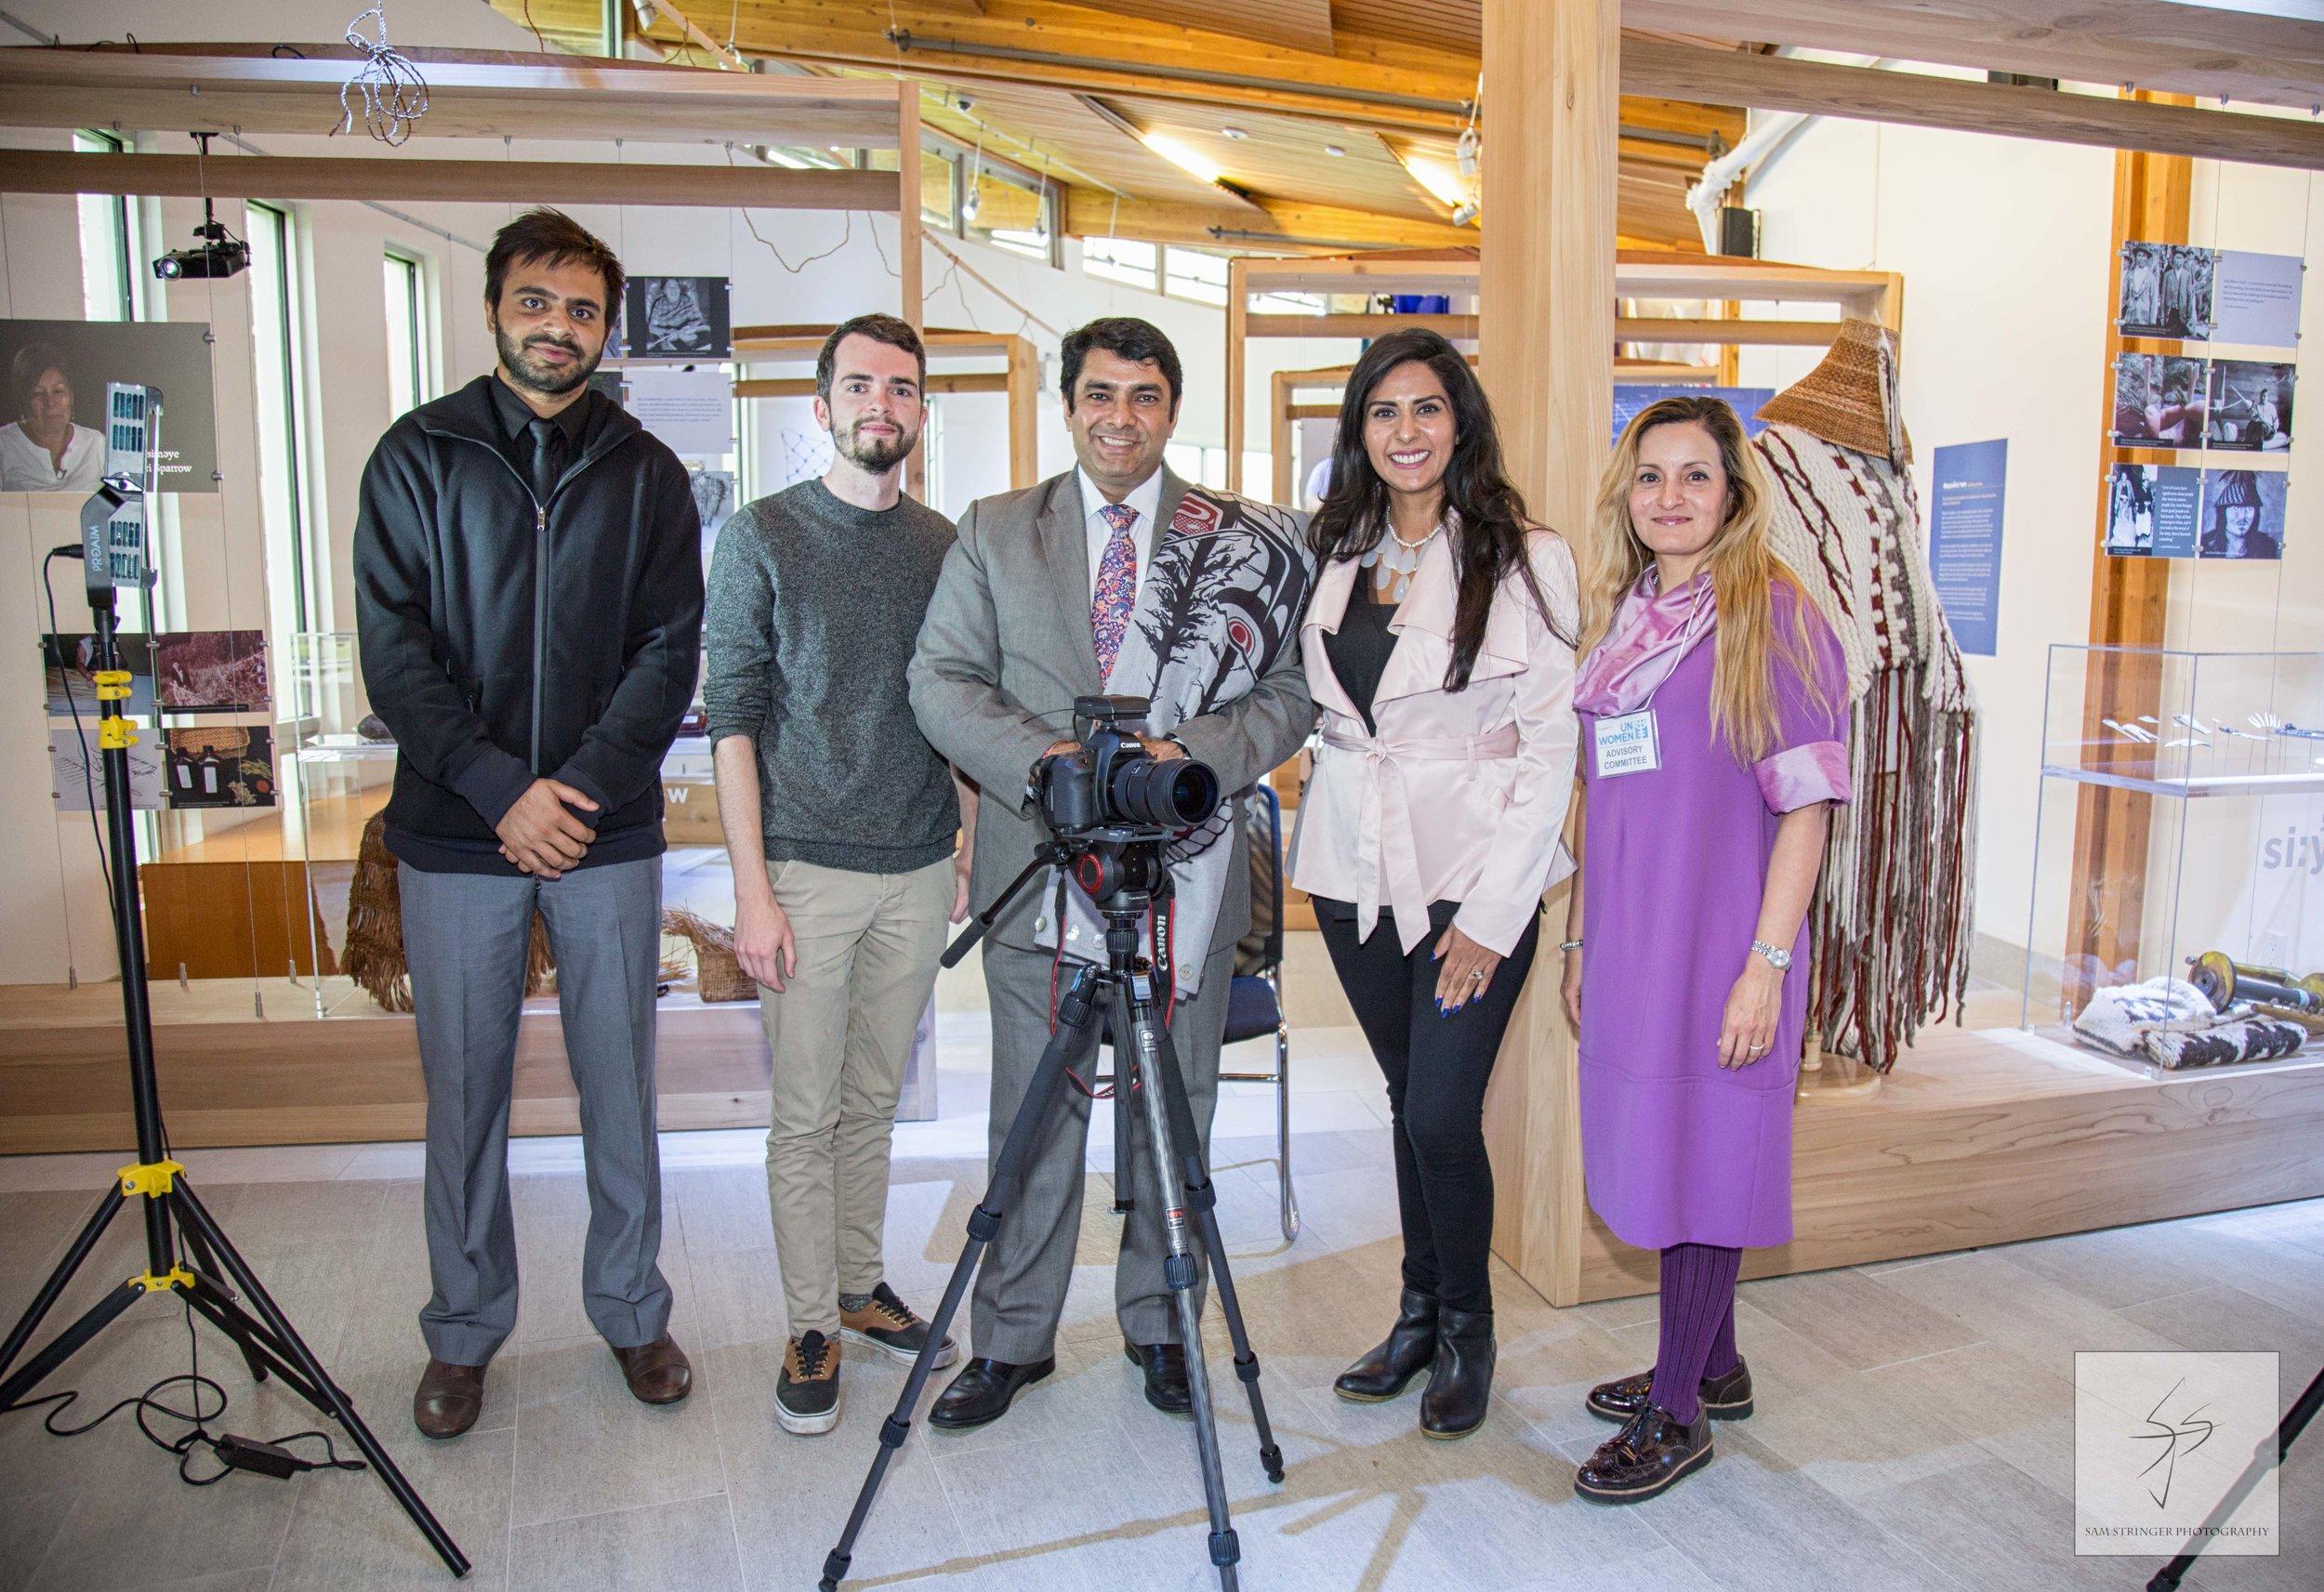 The KharéCom production team poses with Ravi Karkara.